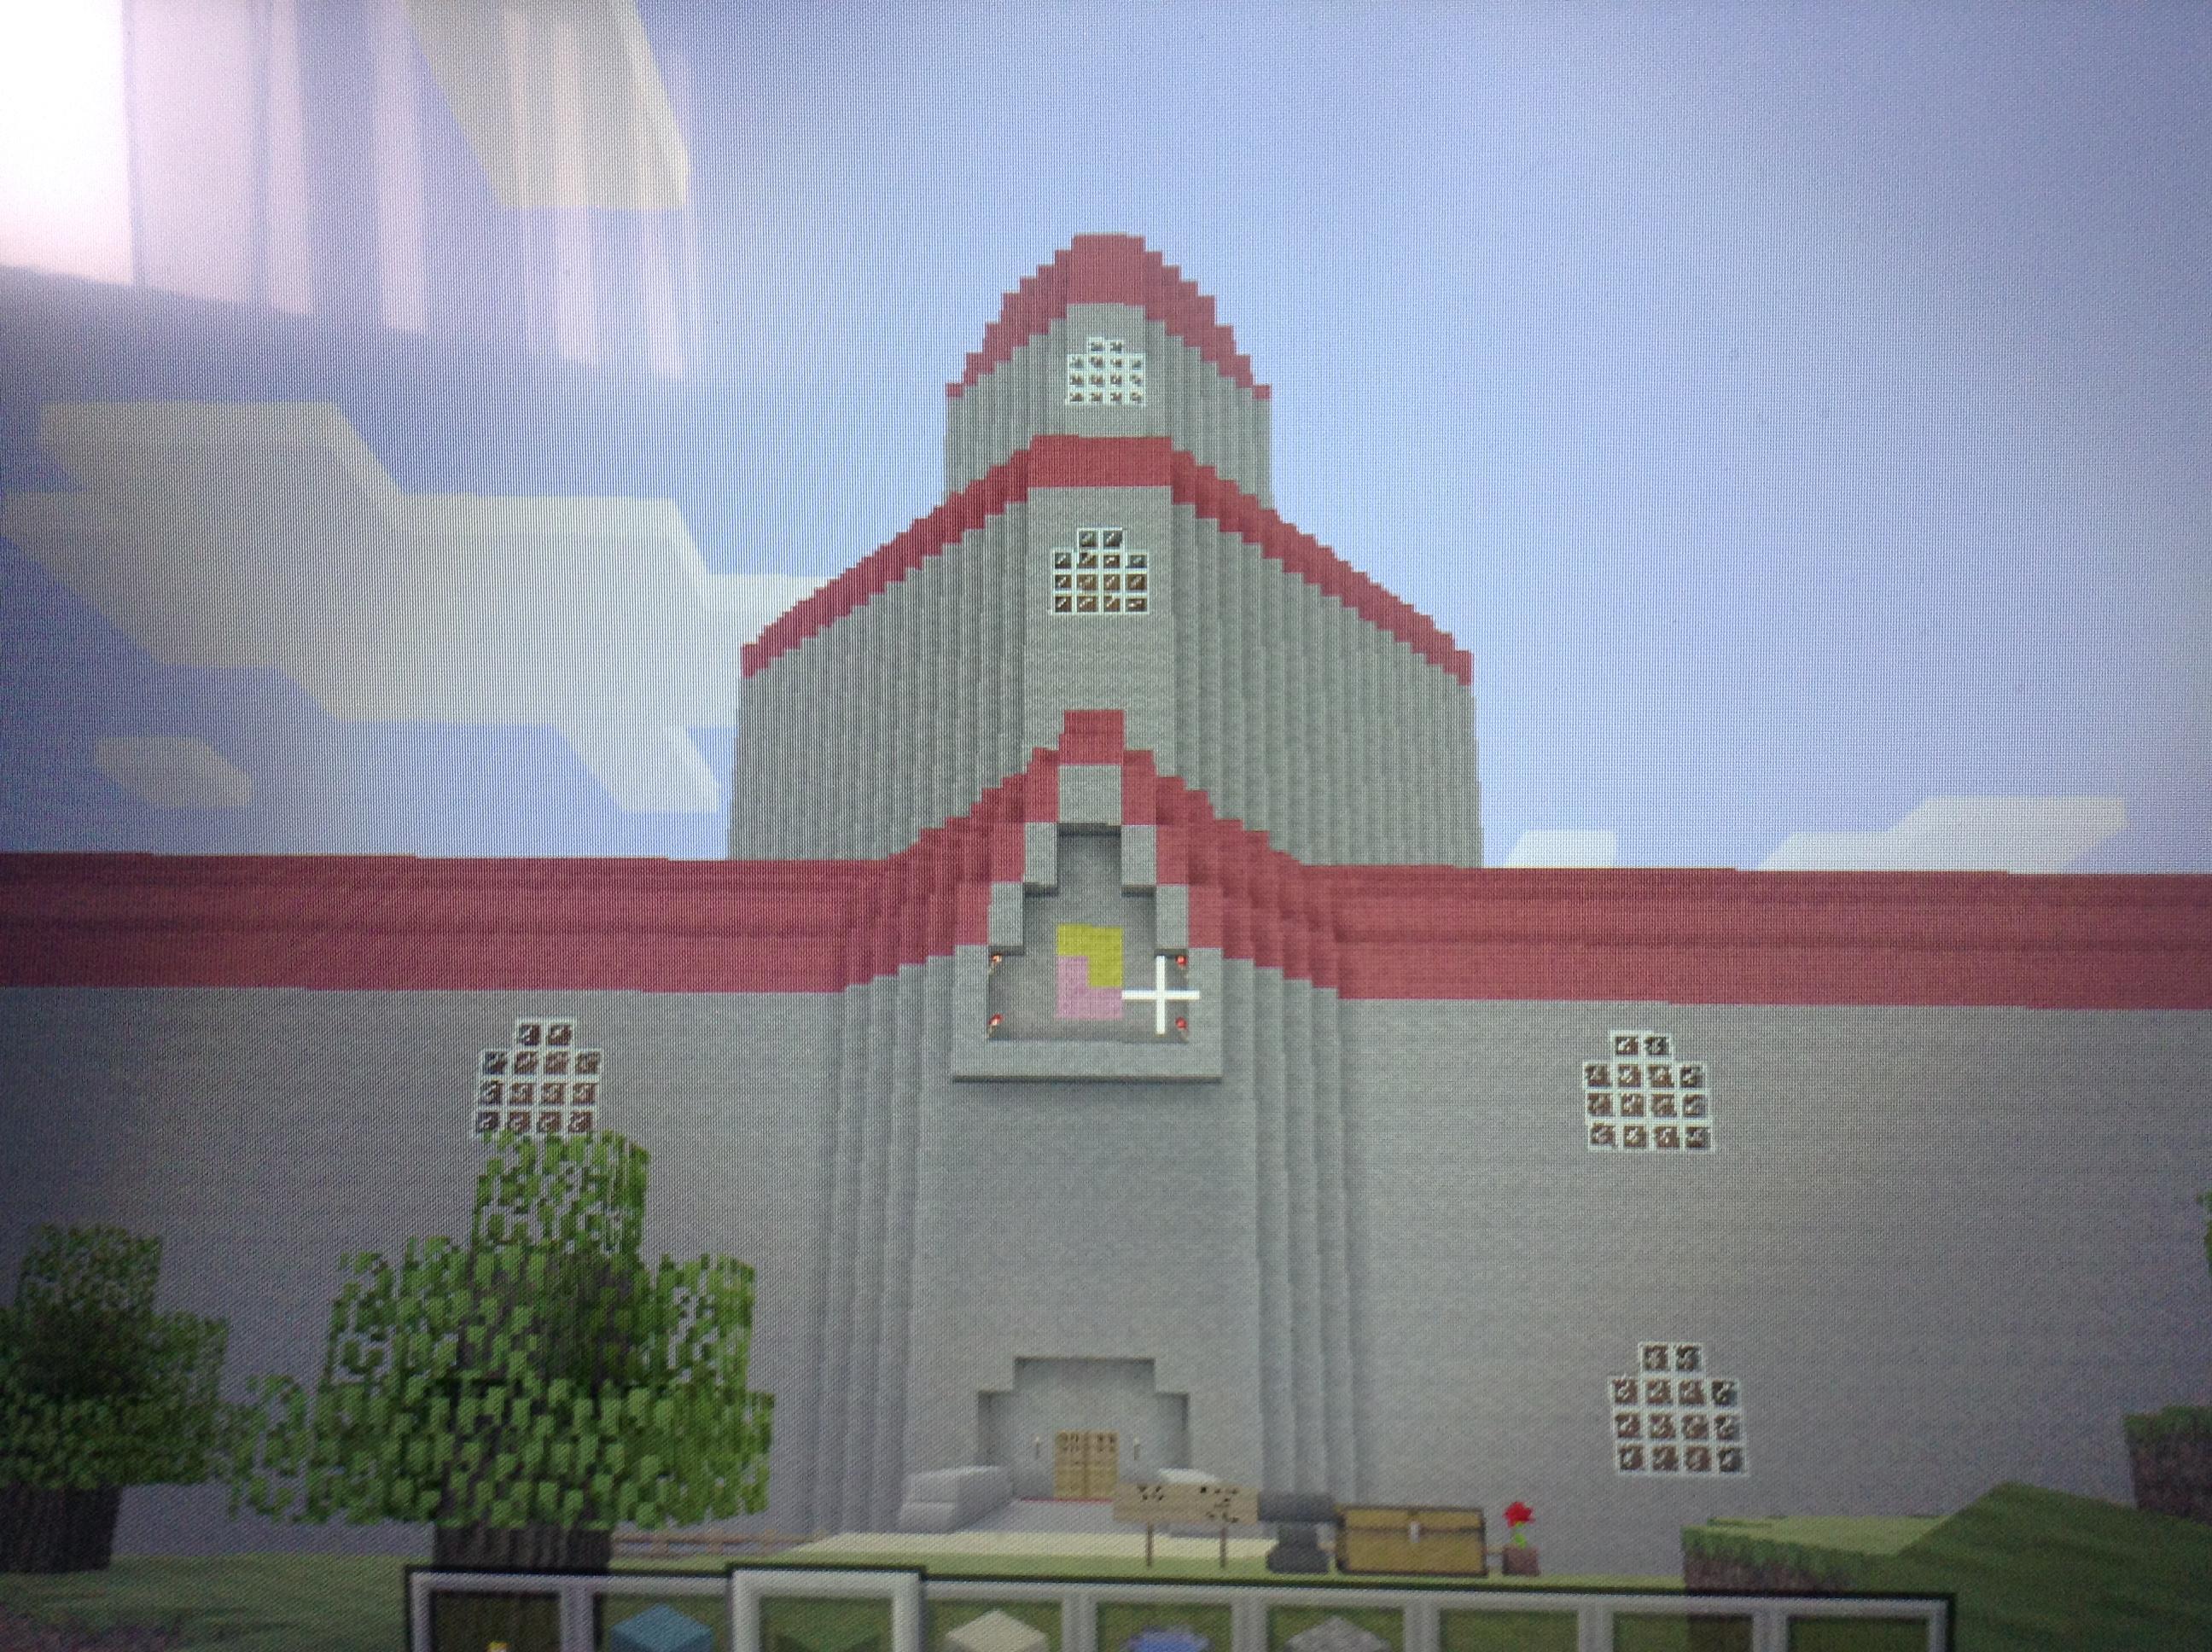 Super Mario 64: Minecraft Xbox 360 Edition WIP - MCX360: Show Your ...